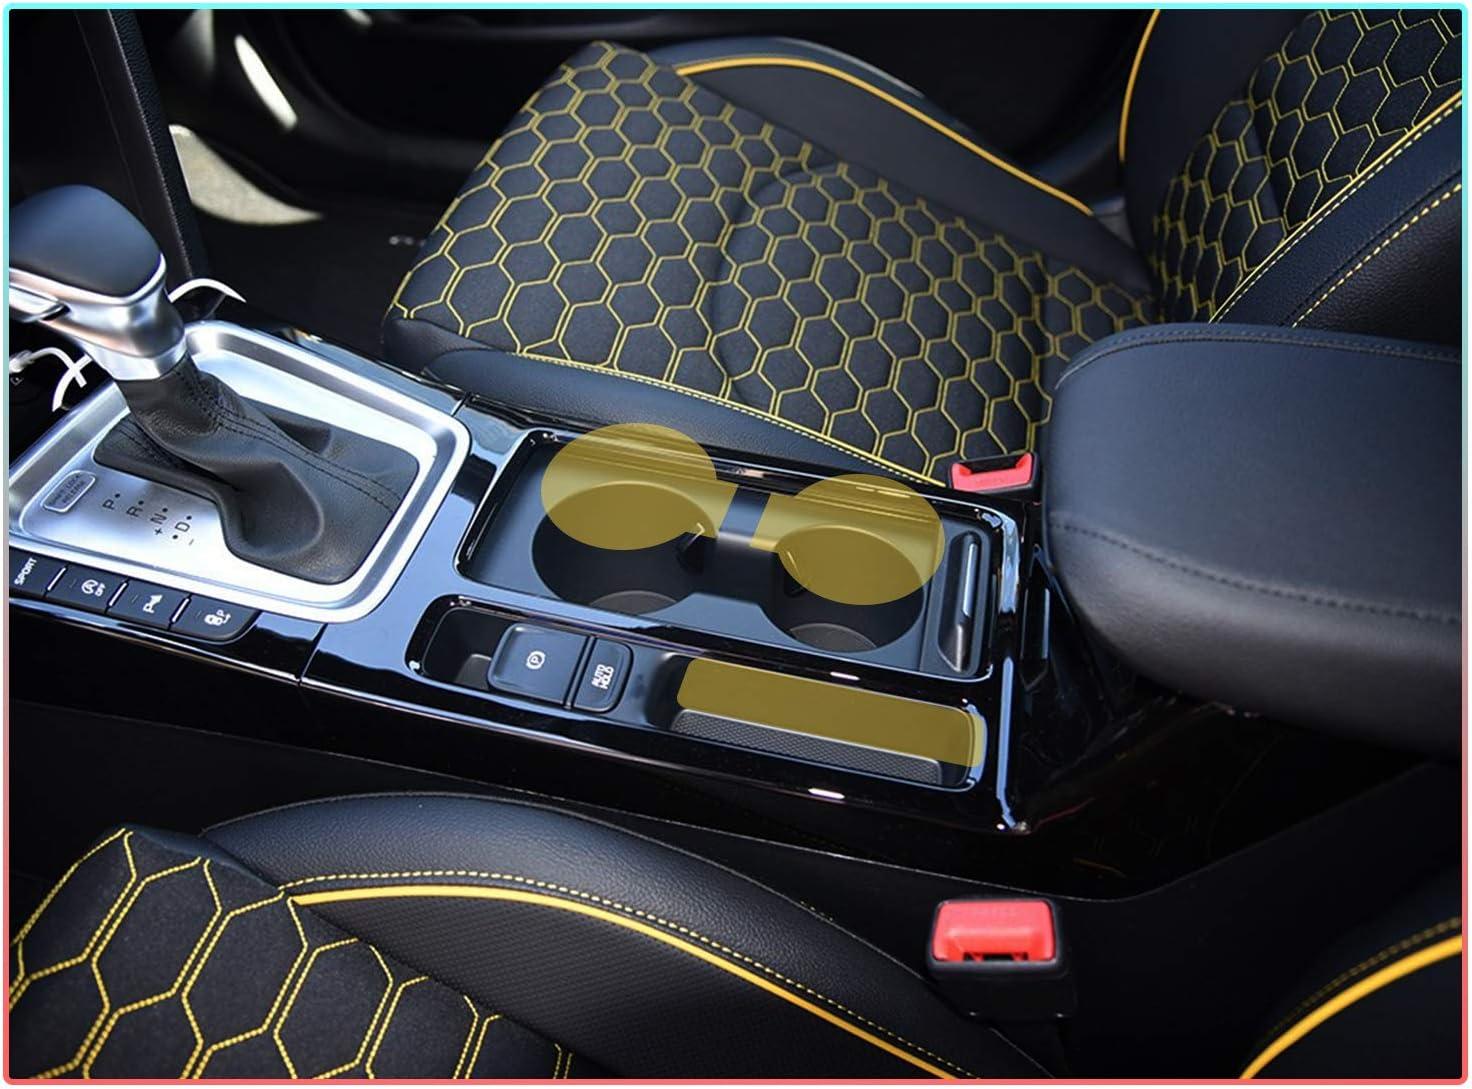 CDEFG f/ür Ceed XCeed Auto Innere T/ürschlitz rutschfest Anti-Staub Becherhalter Matte Arm Box Aufbewahrung Pads